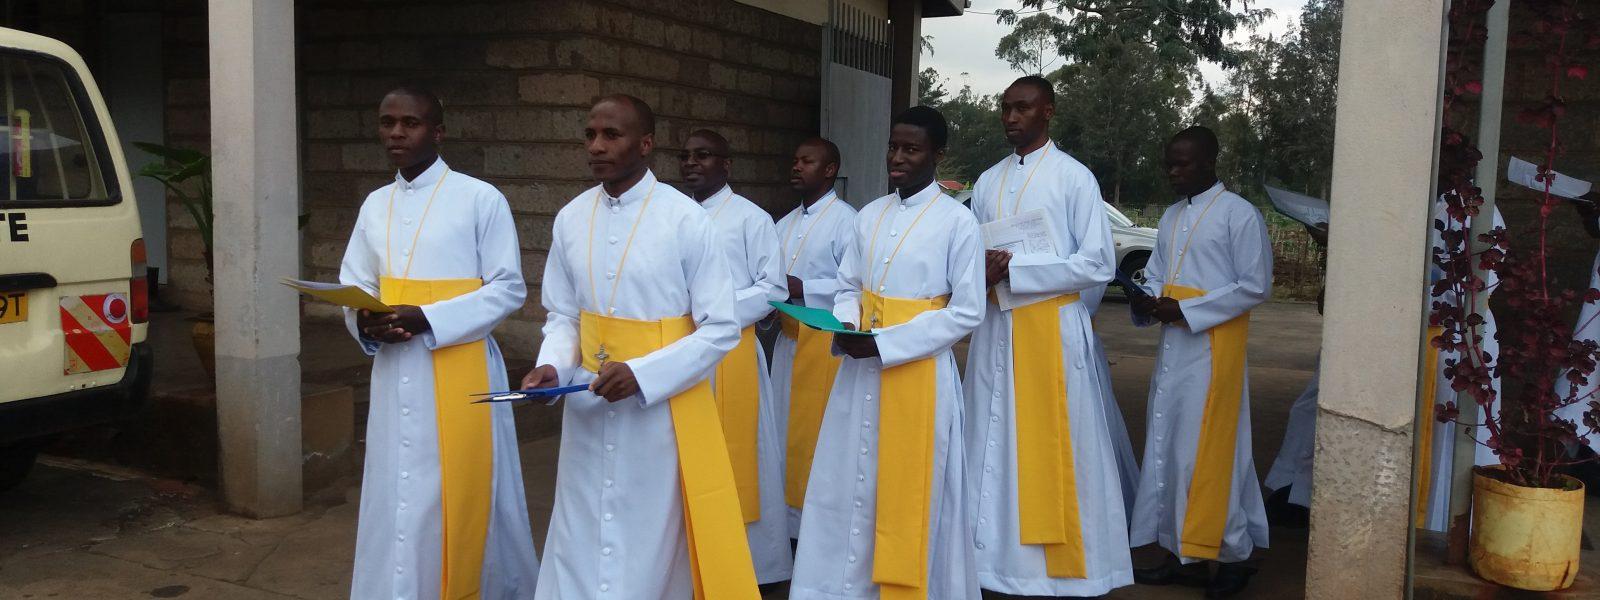 APOSTLES OF JESUS THEOLOGICUM – Apostle Of Jesus Missionaries